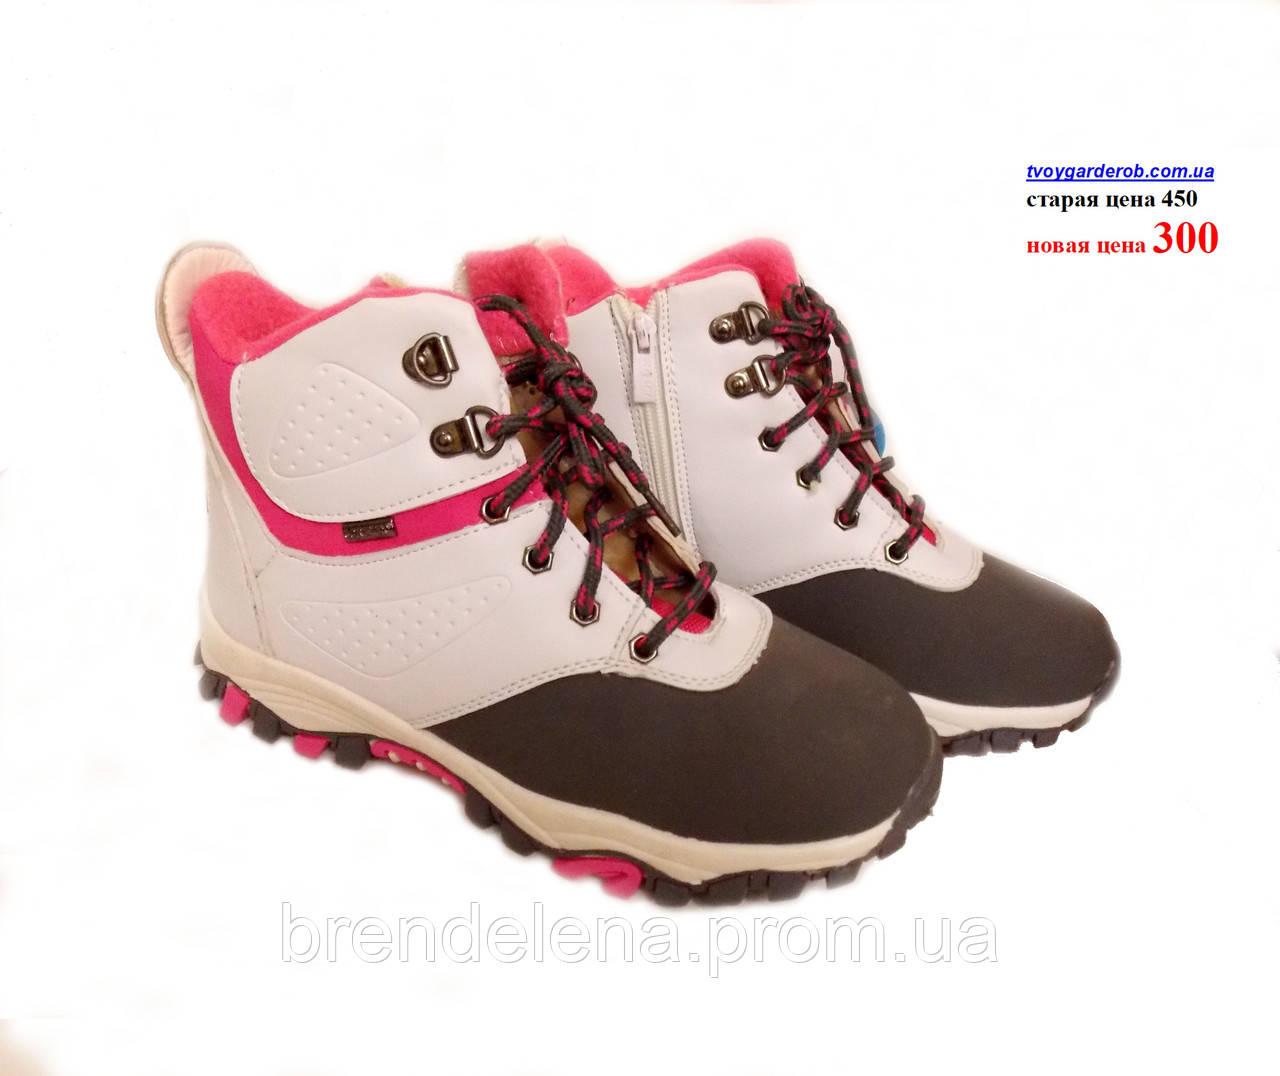 1e0985b07 Ботинки-кроссовки для девочки р.(32-37)распродажа витрины., цена 300 грн.,  купить Олешки — Prom.ua (ID#831892907)